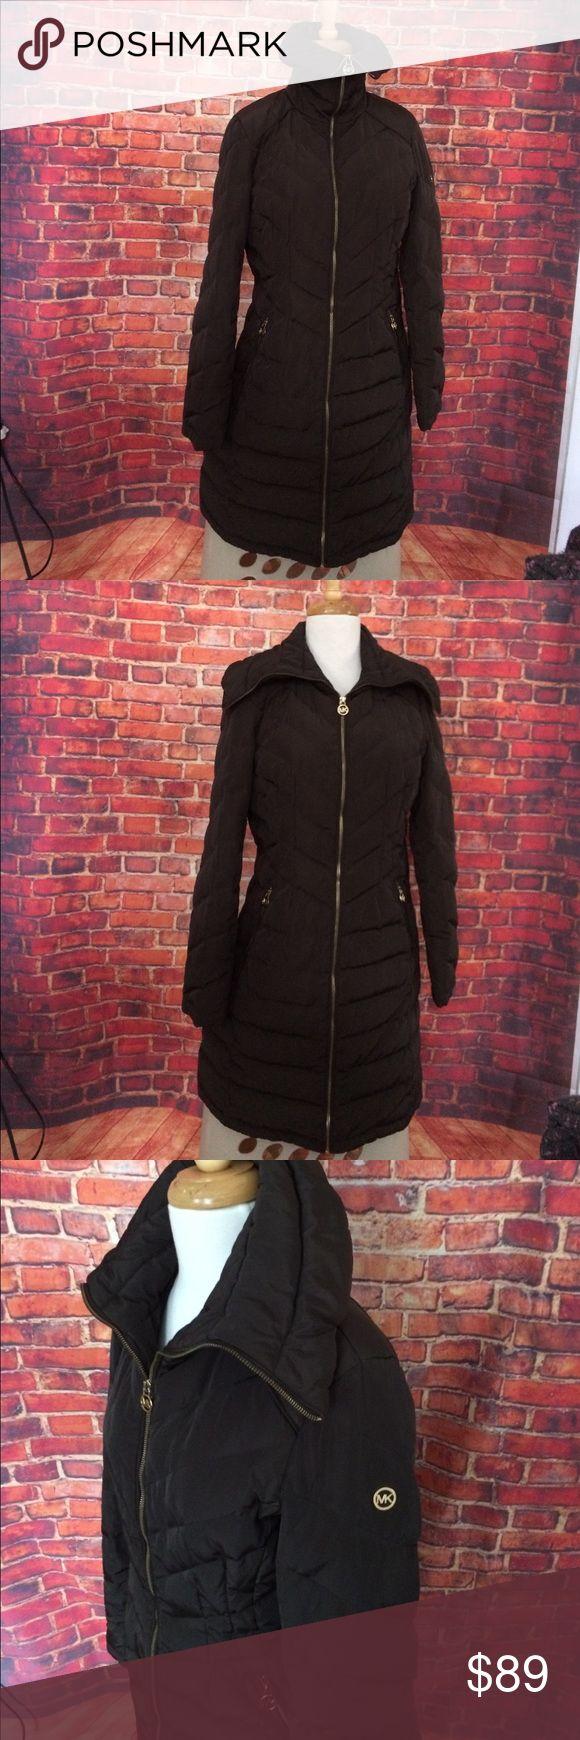 Michael Kors Brown Down Puffer Coat Size M Michael Kors Brown Down Puffer Coat Size M Michael Kors Jackets & Coats Puffers